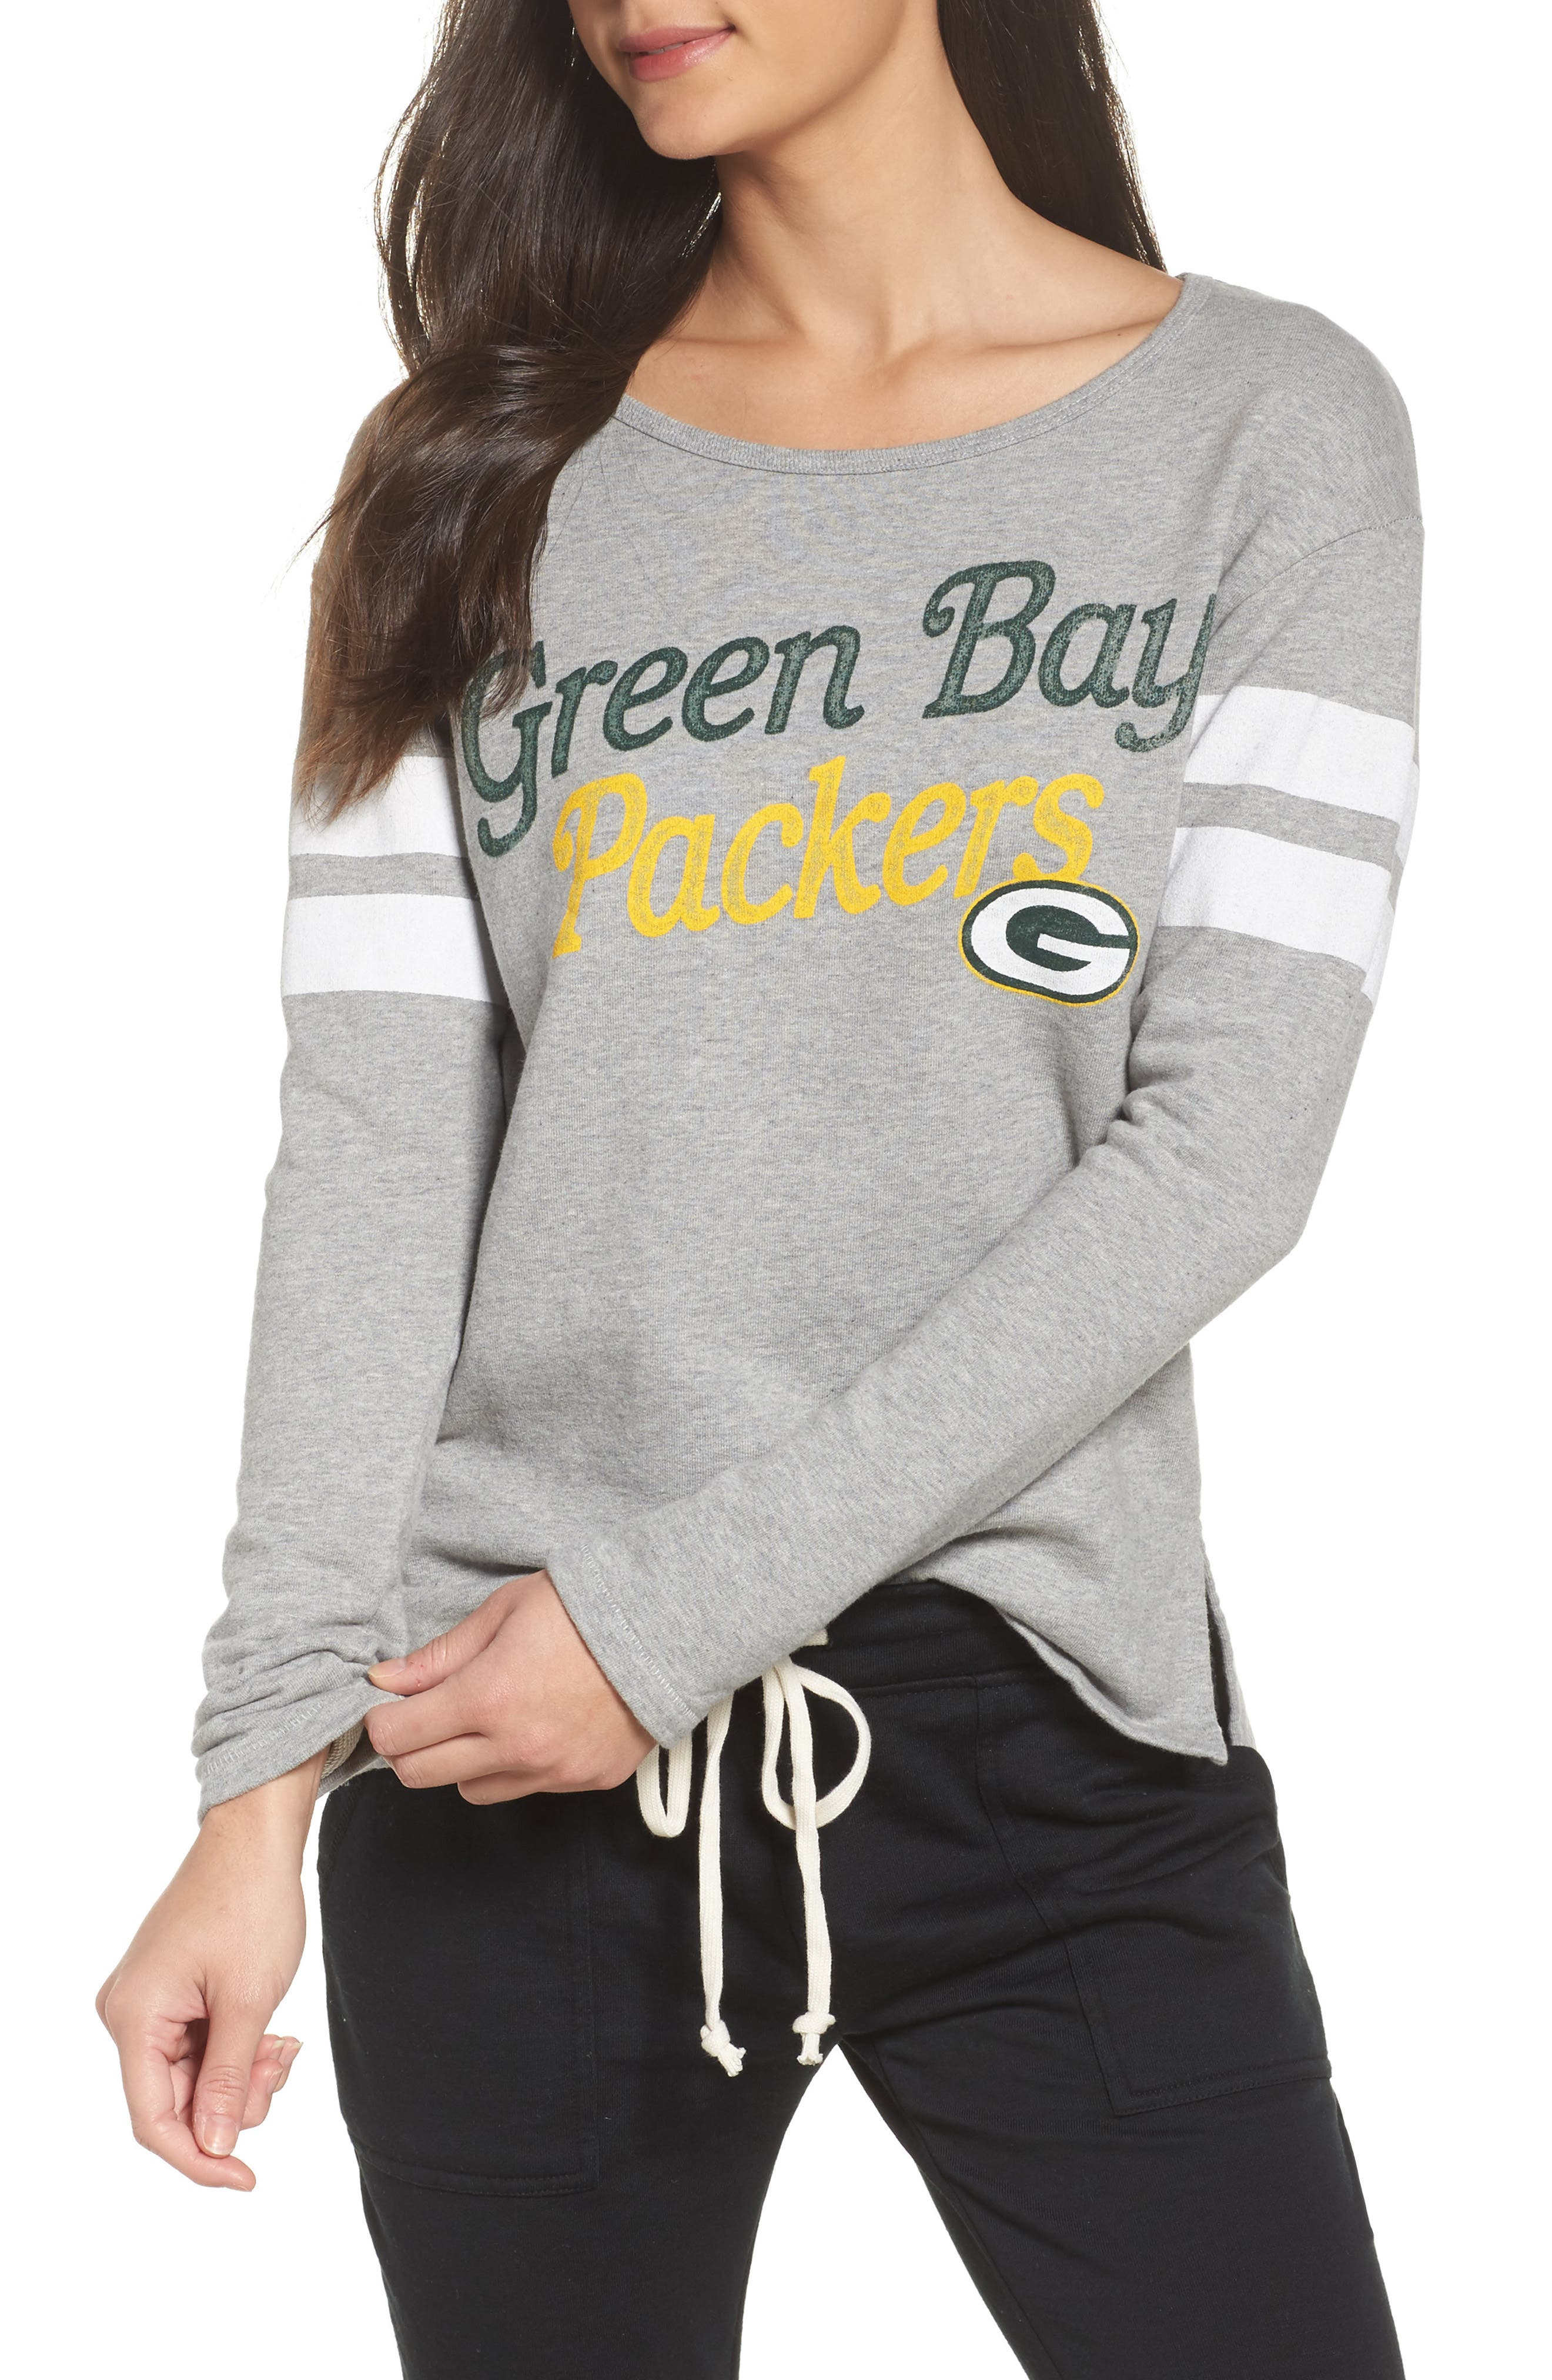 Junk Food NFL Green Bay Packers Champion Sweatshirt